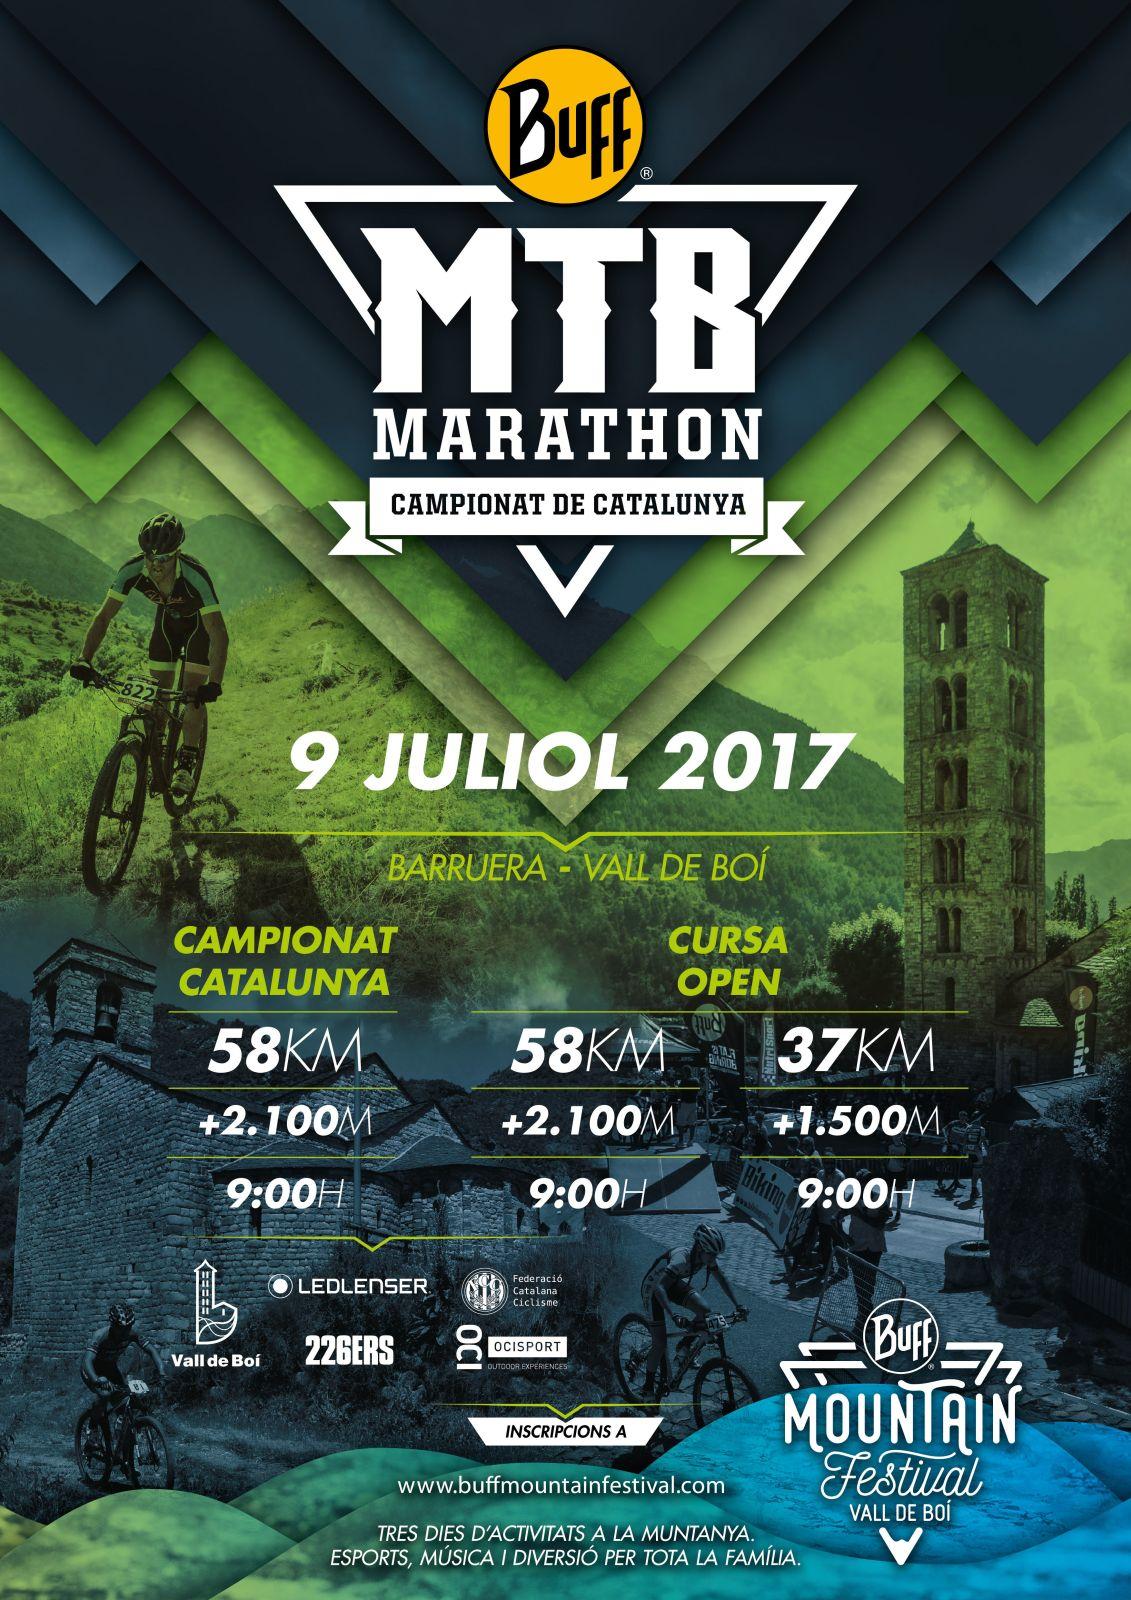 Buff MTB Marathon